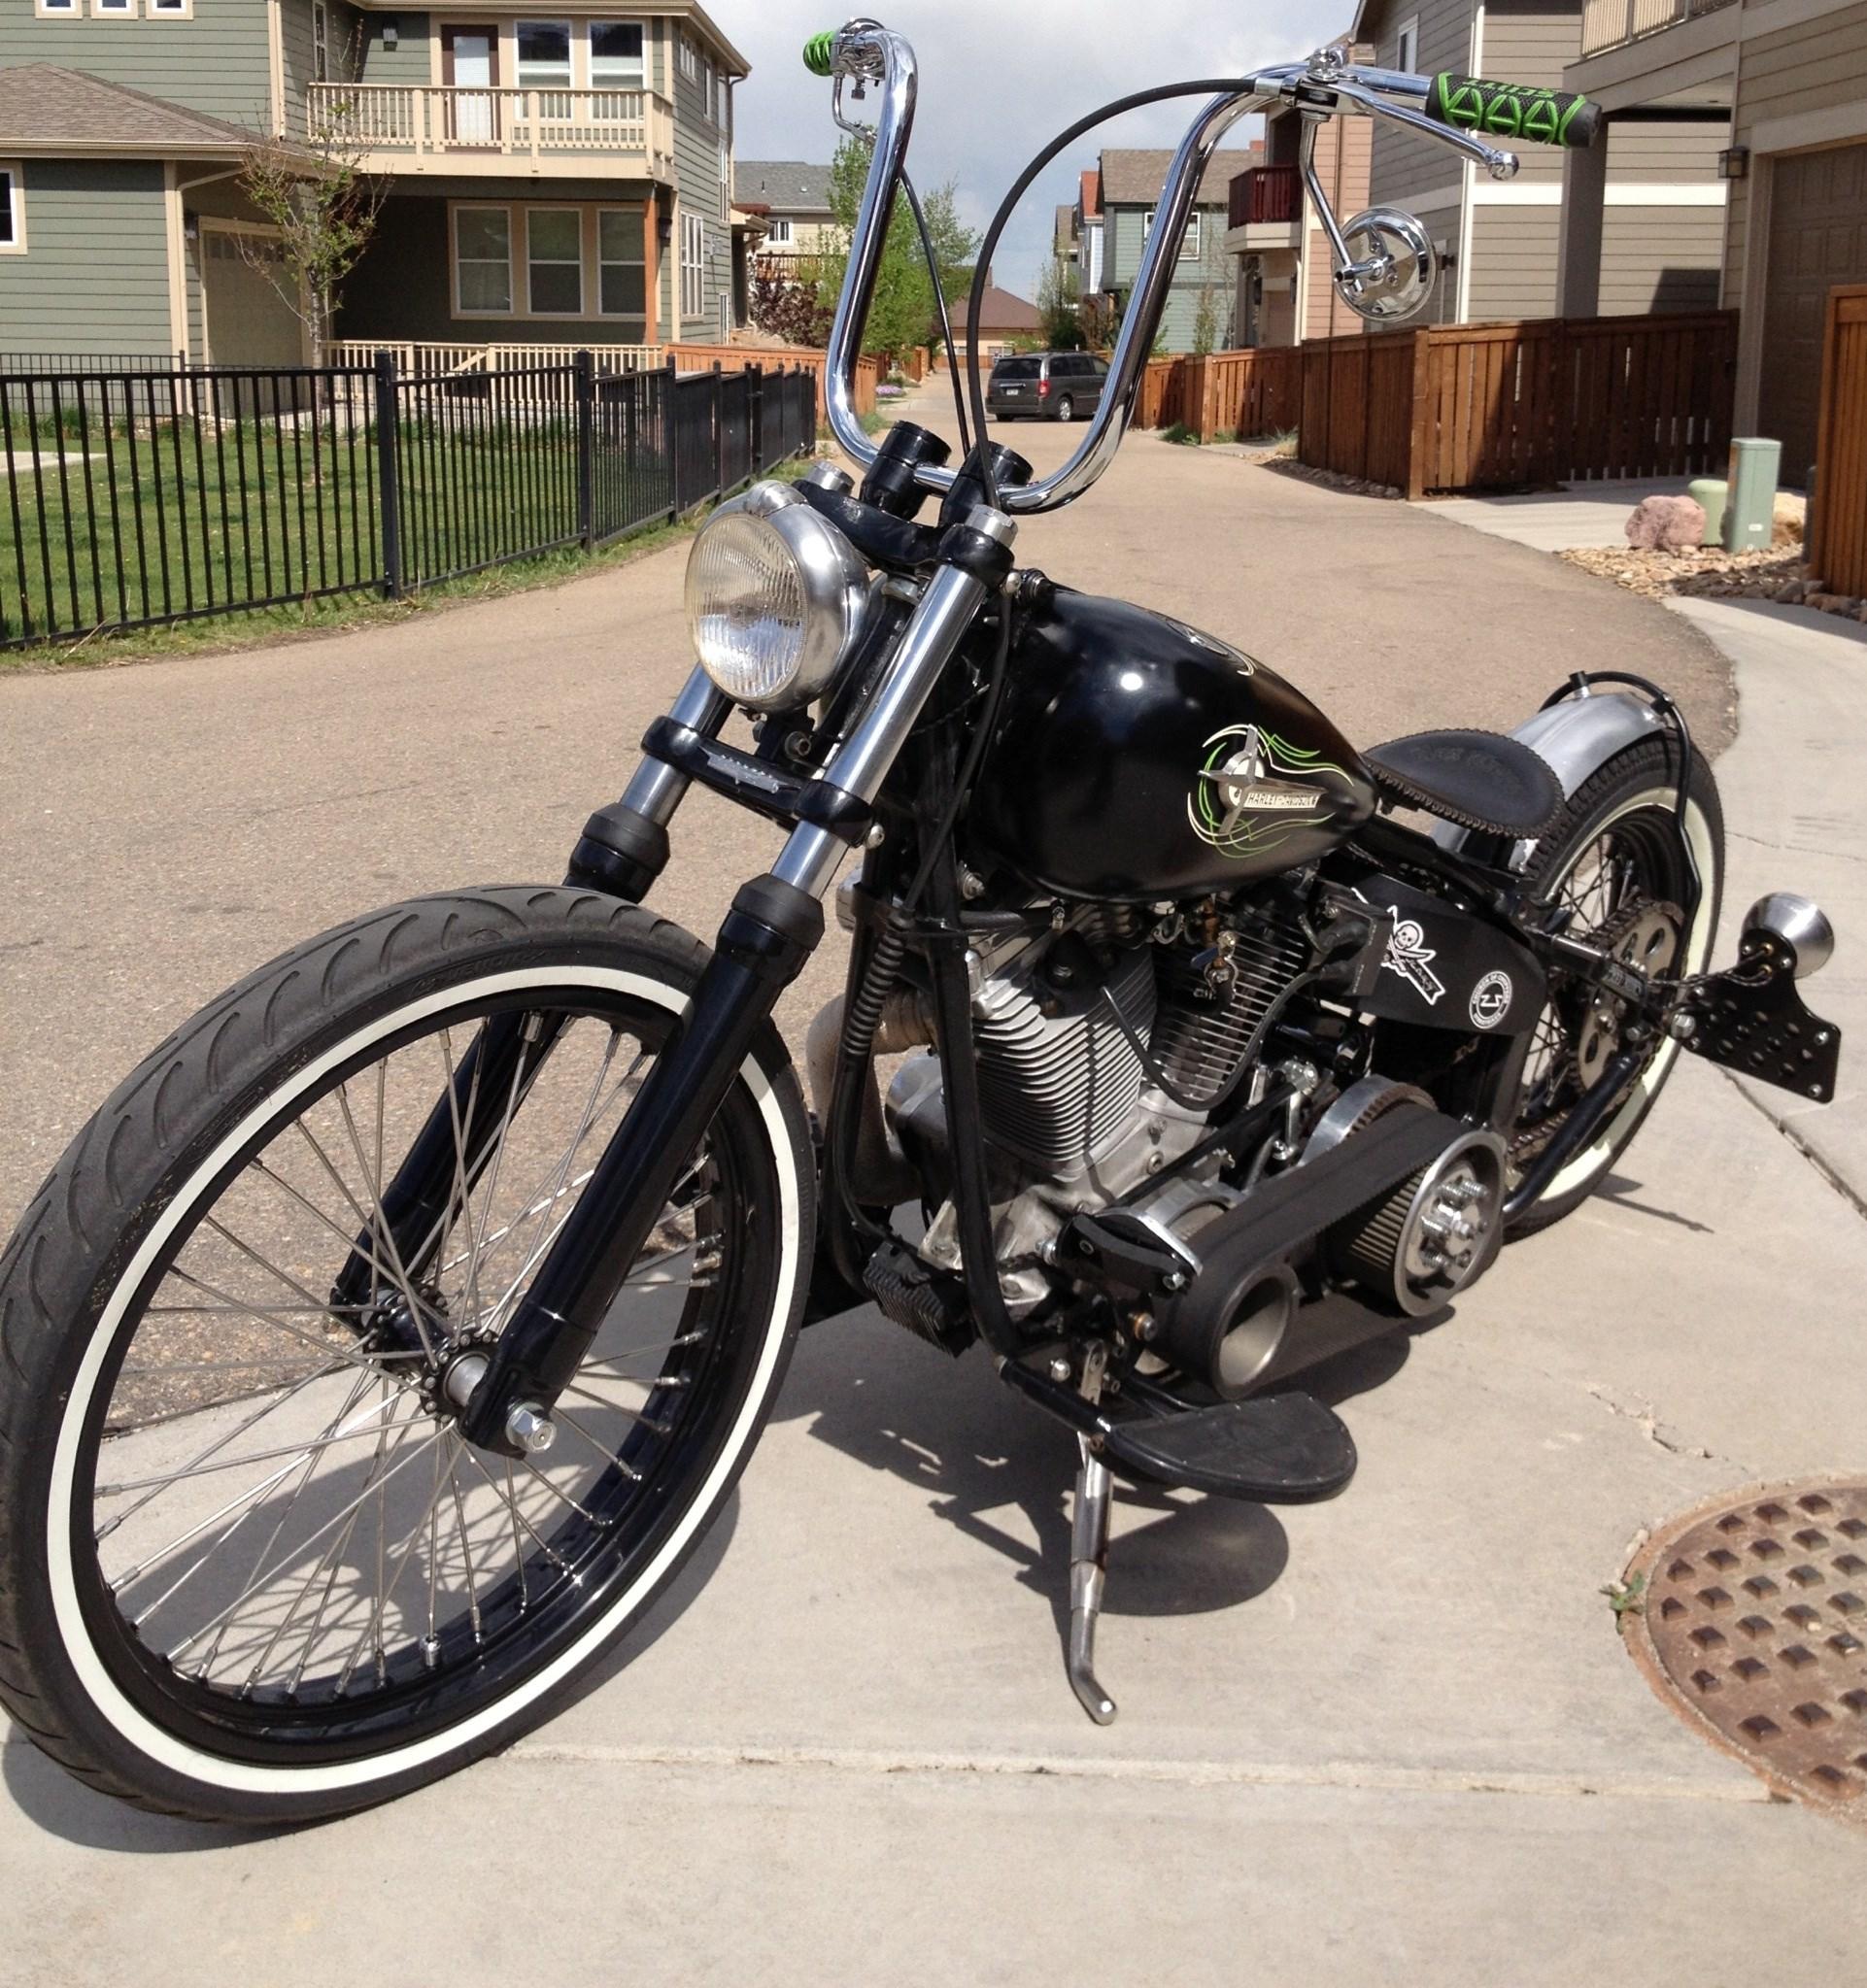 1986 Harley-Davidson® FLST Heritage Softail® (Black